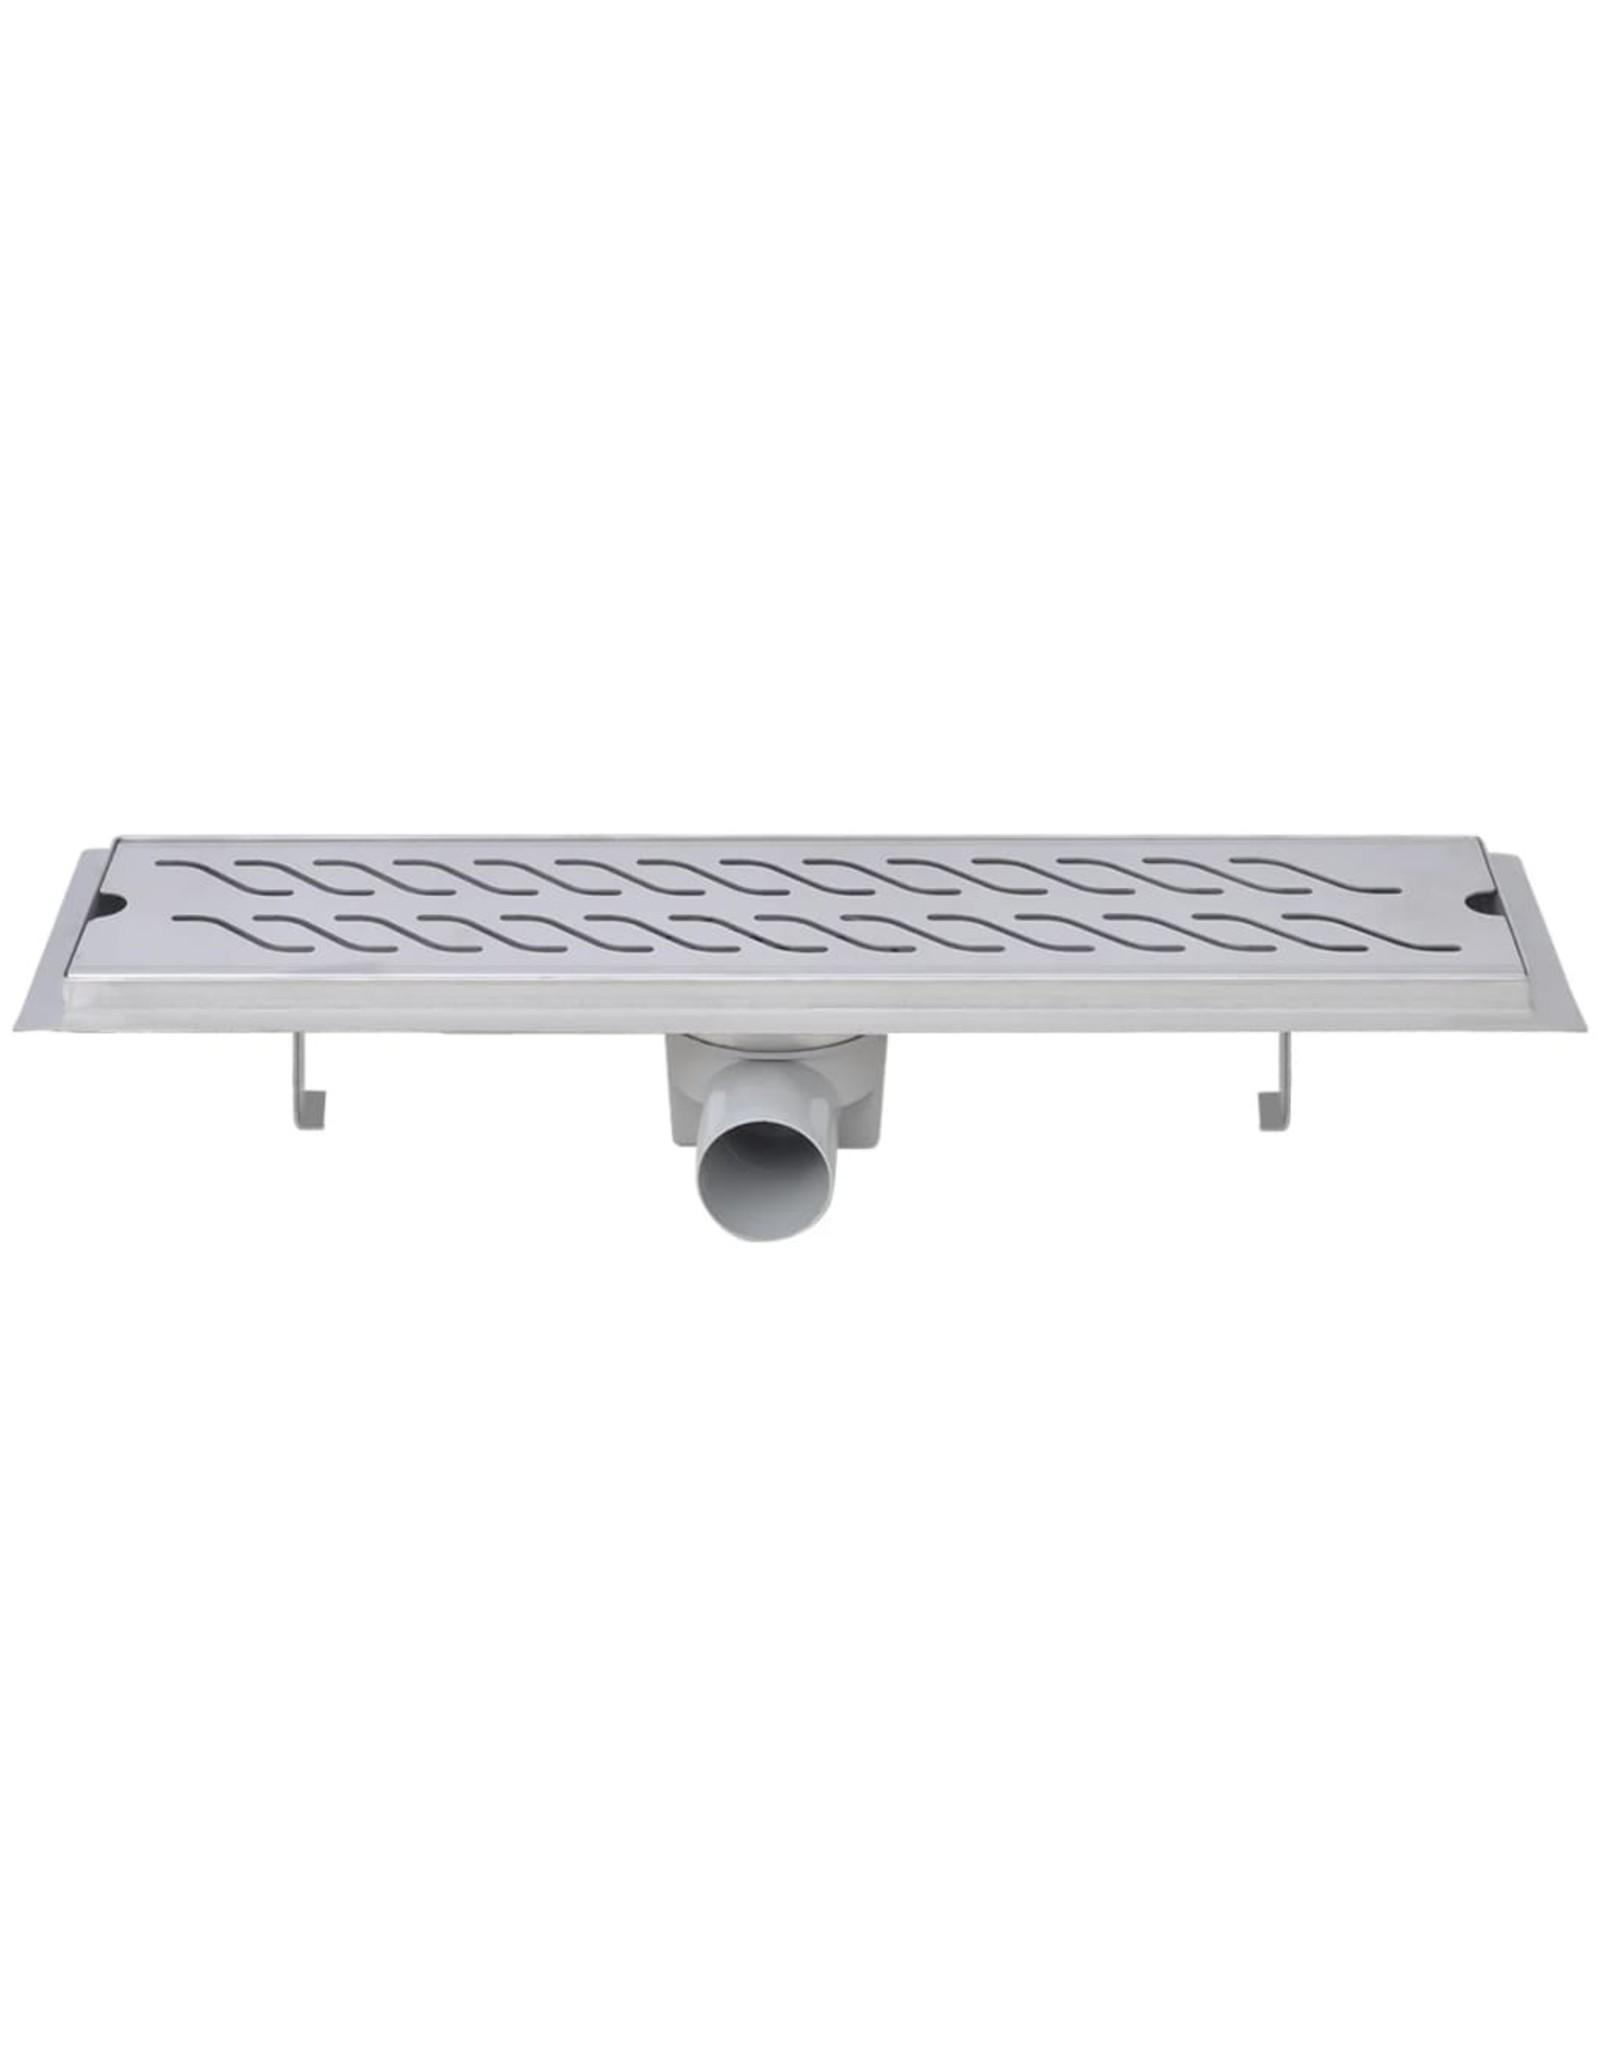 Doucheafvoer 2 st rechthoekig golvend 530x140 mm roestvrij staal